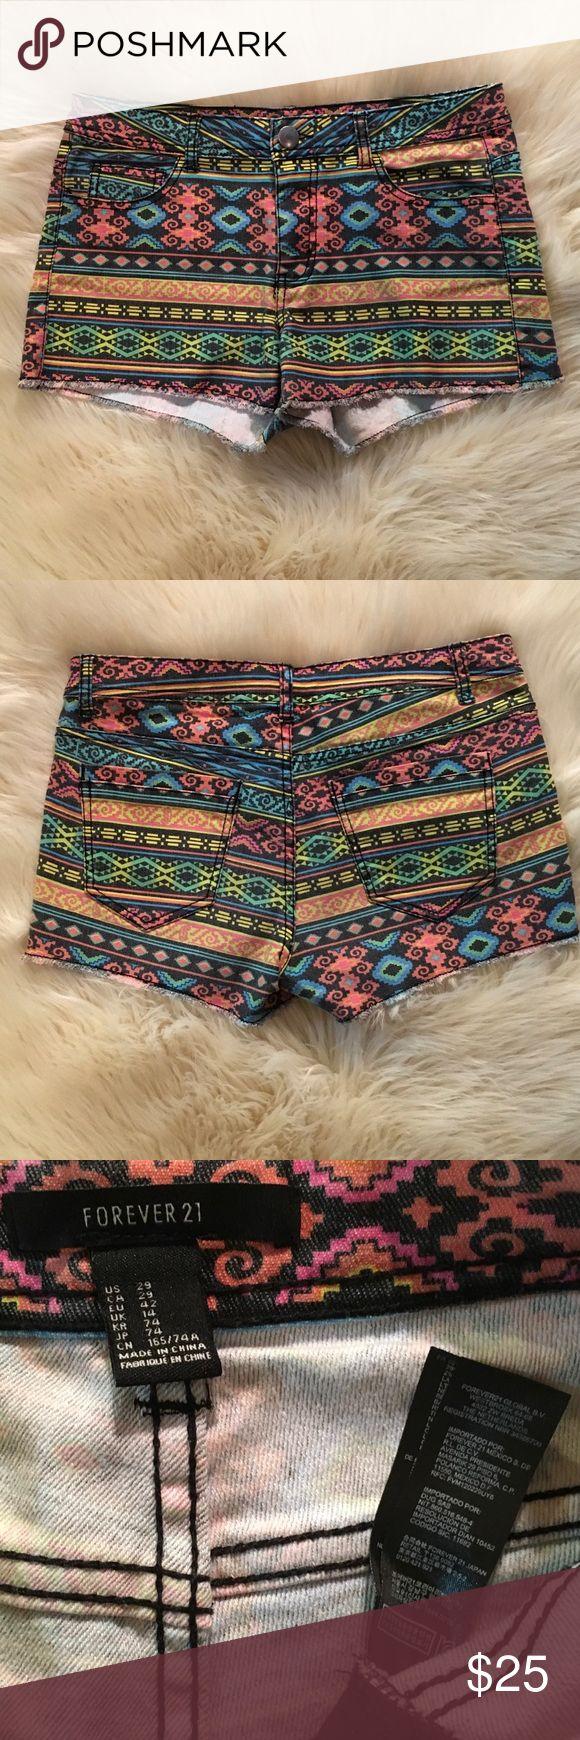 "Forever 21 Colorful Aztec Tribal Shorts Sz 29 NWOT Forever 21 Colorful Aztec Tribal Shorts. Raw Edge. Black stitching. Inseam 2.5"", Rise 9"" size 29, US 8 NWOT Forever 21 Shorts Jean Shorts"